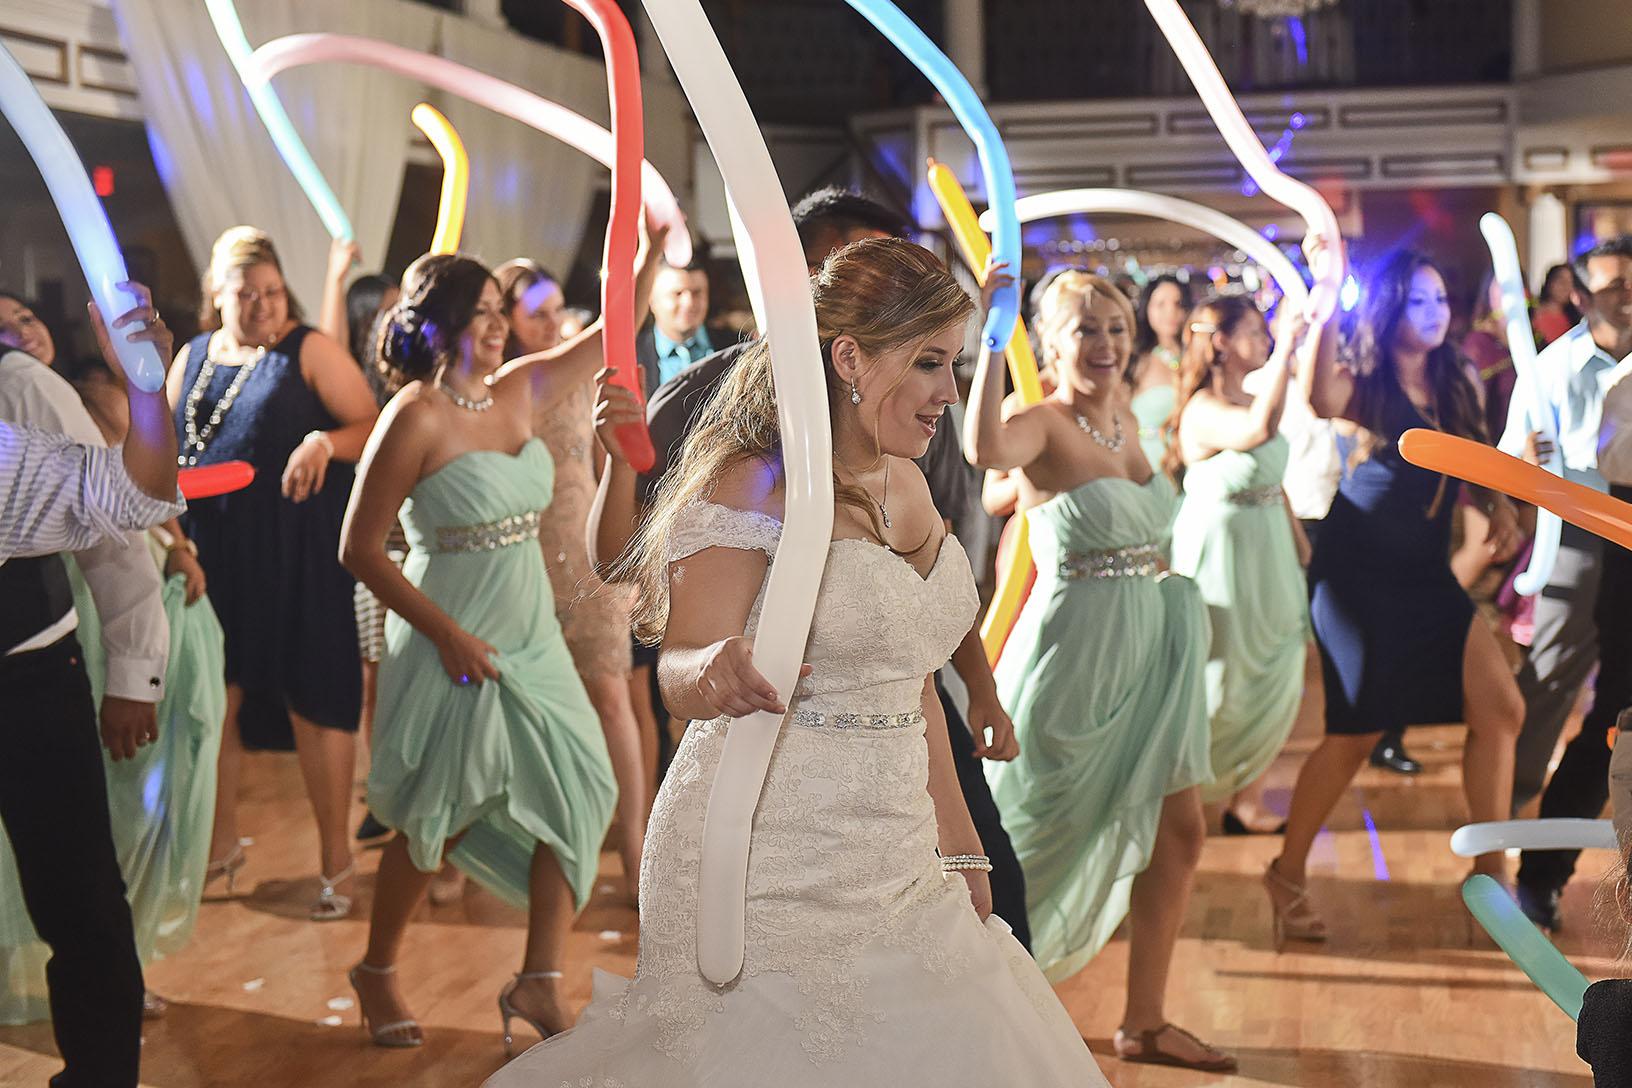 Sugar Land Wedding dancing candid 3